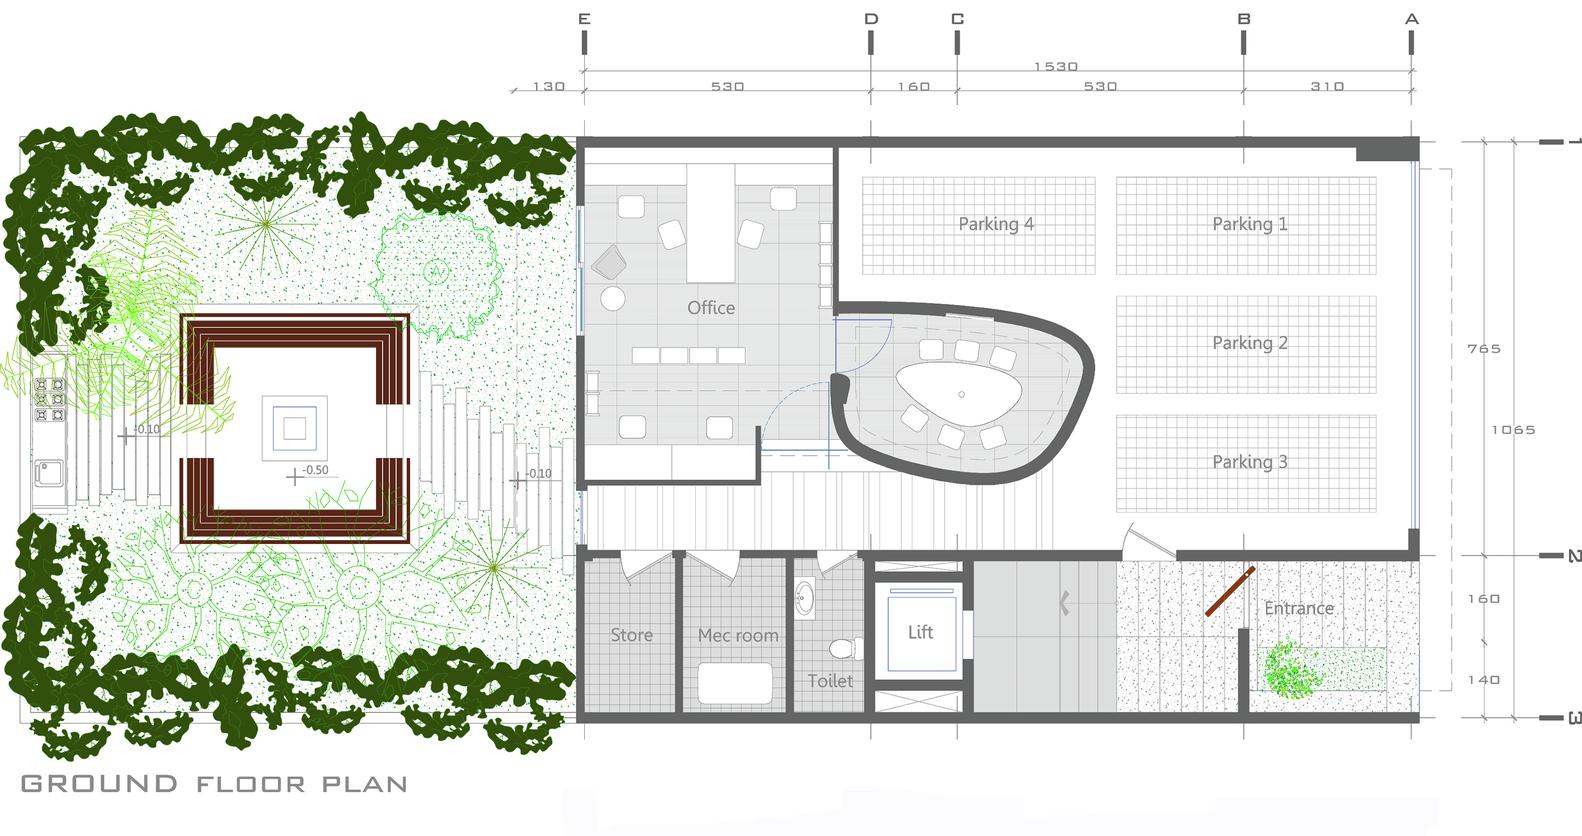 Kuća 144 By Ali Sodagaran Nazanin Kazerounian Mojstan Net